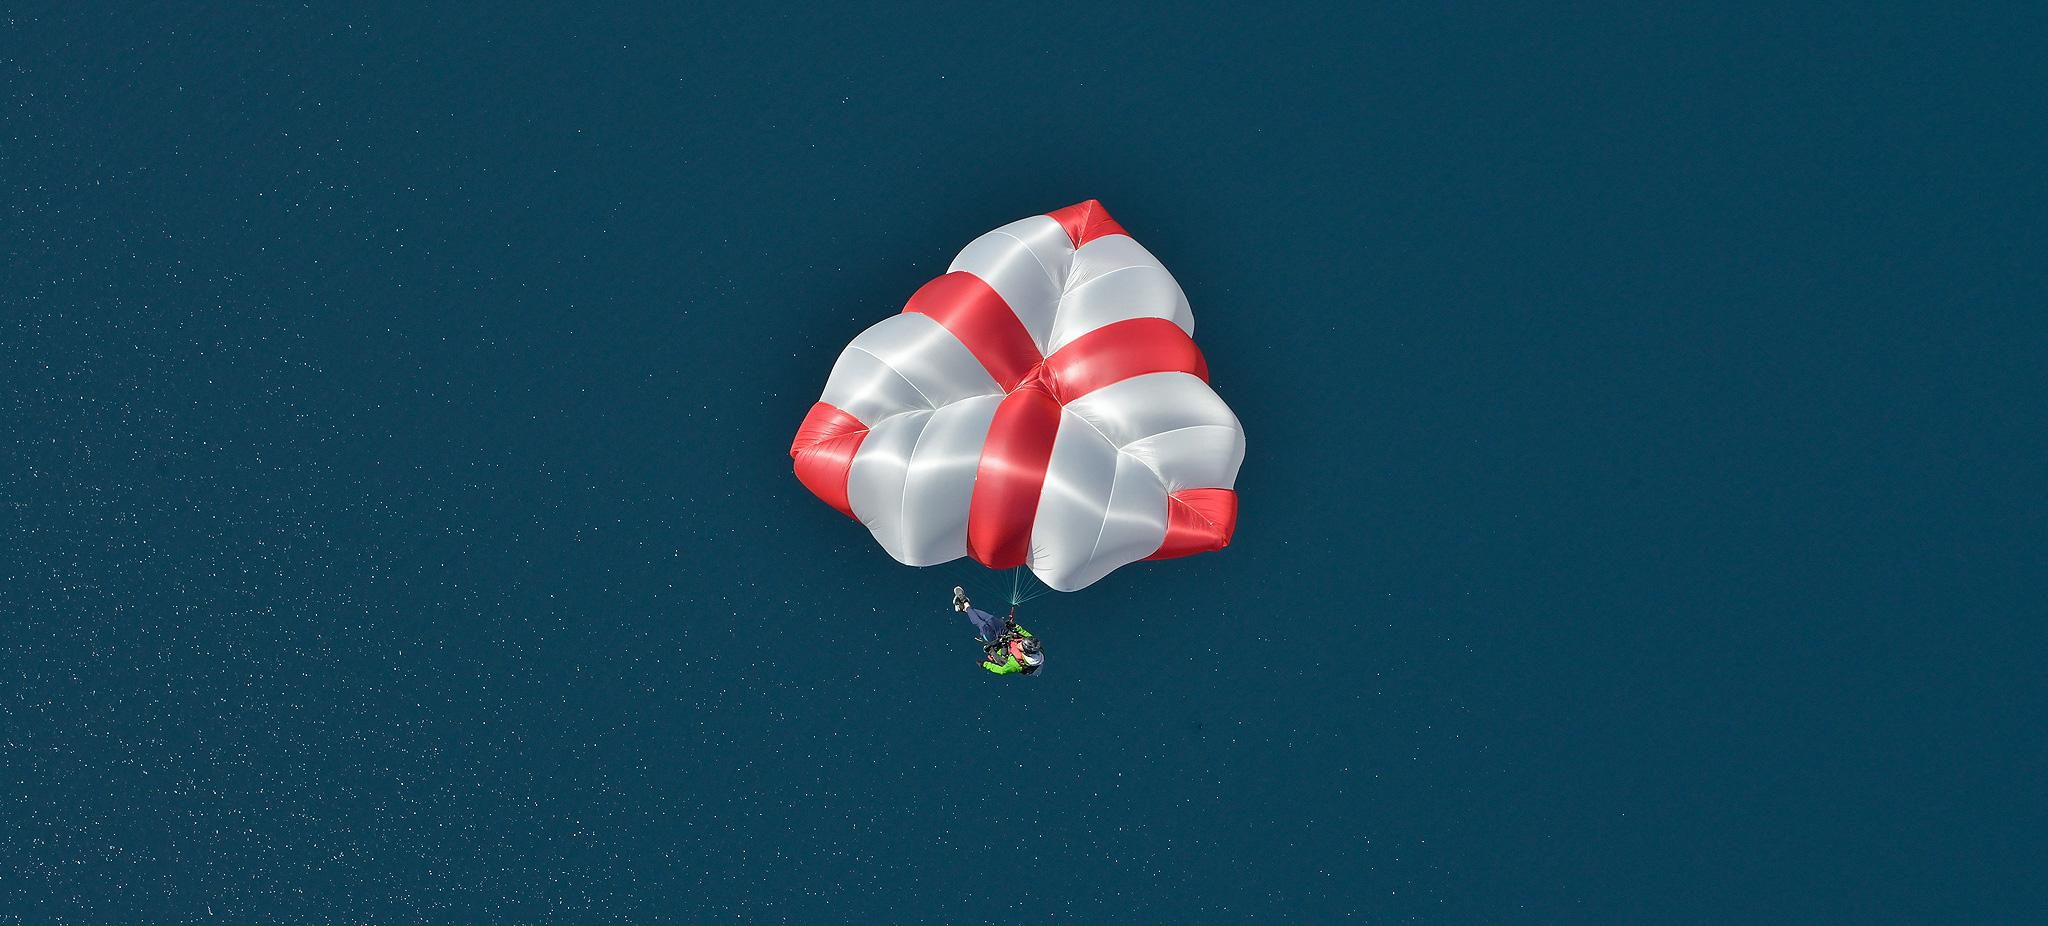 X-TWO ultimativ leicht Rettung